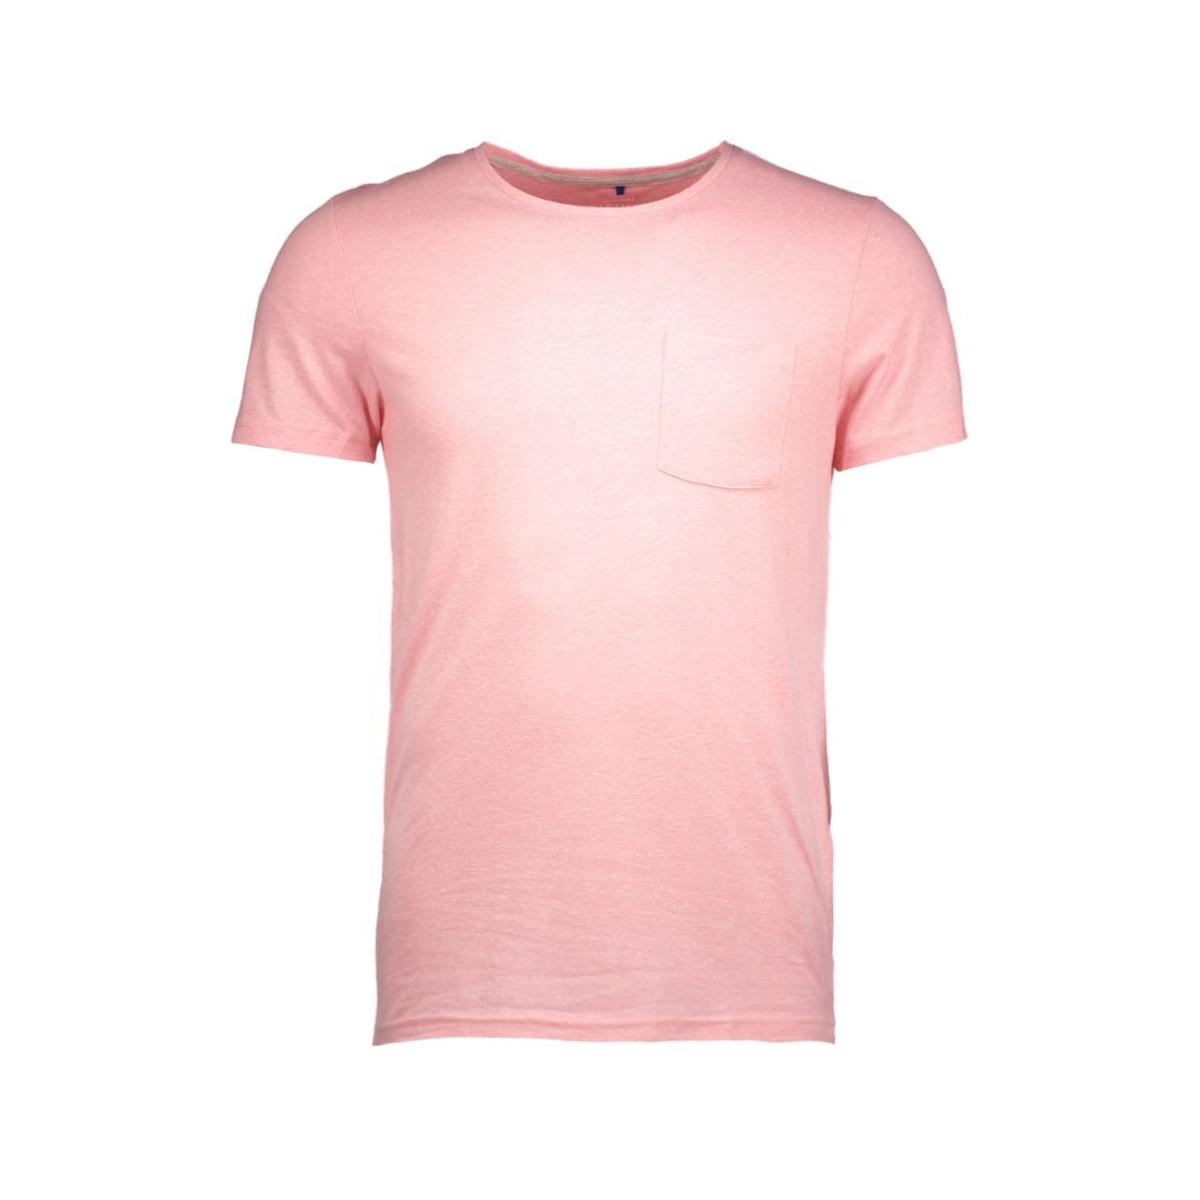 jorbullypocket tee ss crew neck 12106505 jack & jones t-shirt quartz pink/pocket.ta